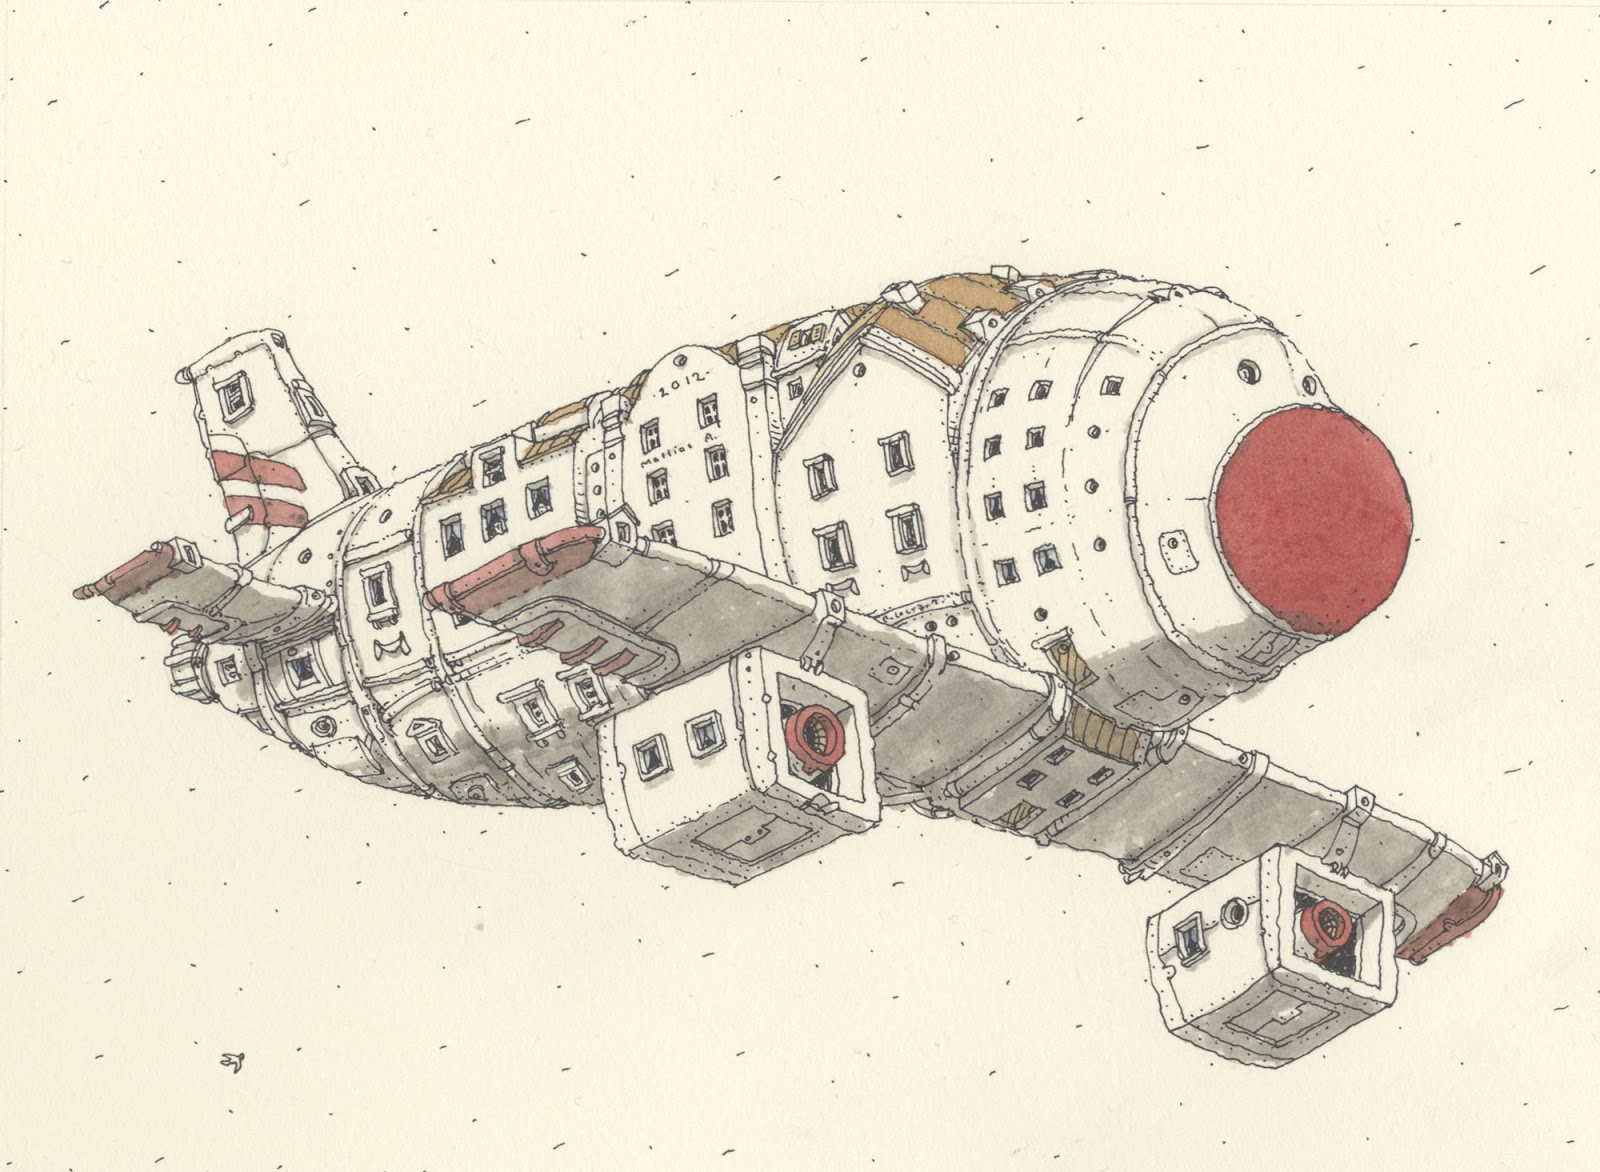 Mattias Inks House Plane